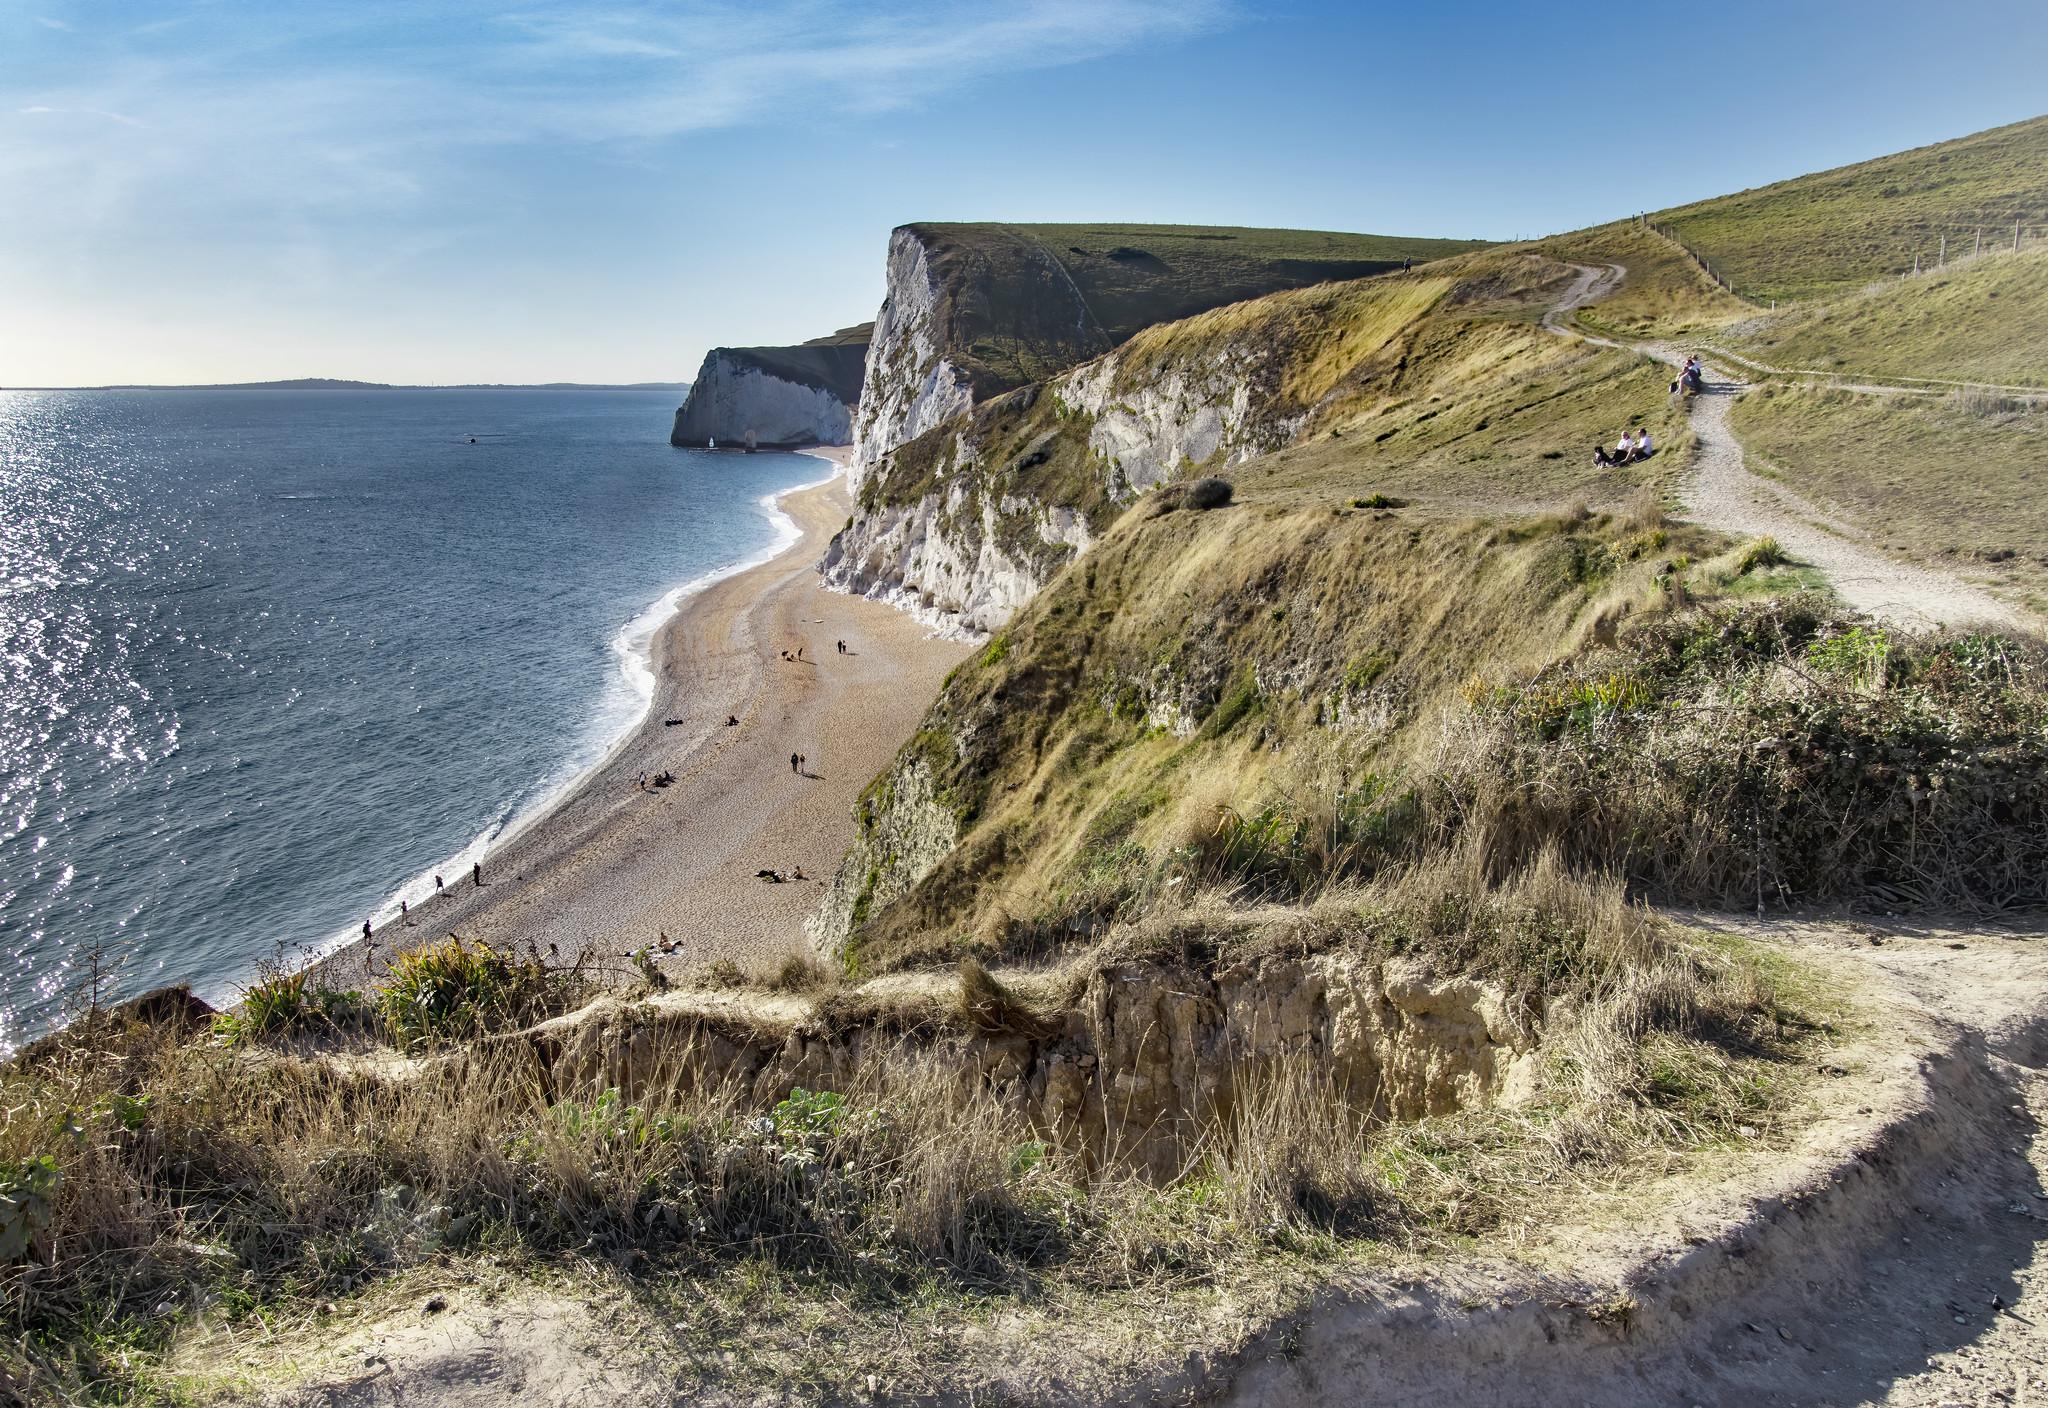 Dorset Jurassic Coast near the Durdle Door by Doris Rapp.jpg